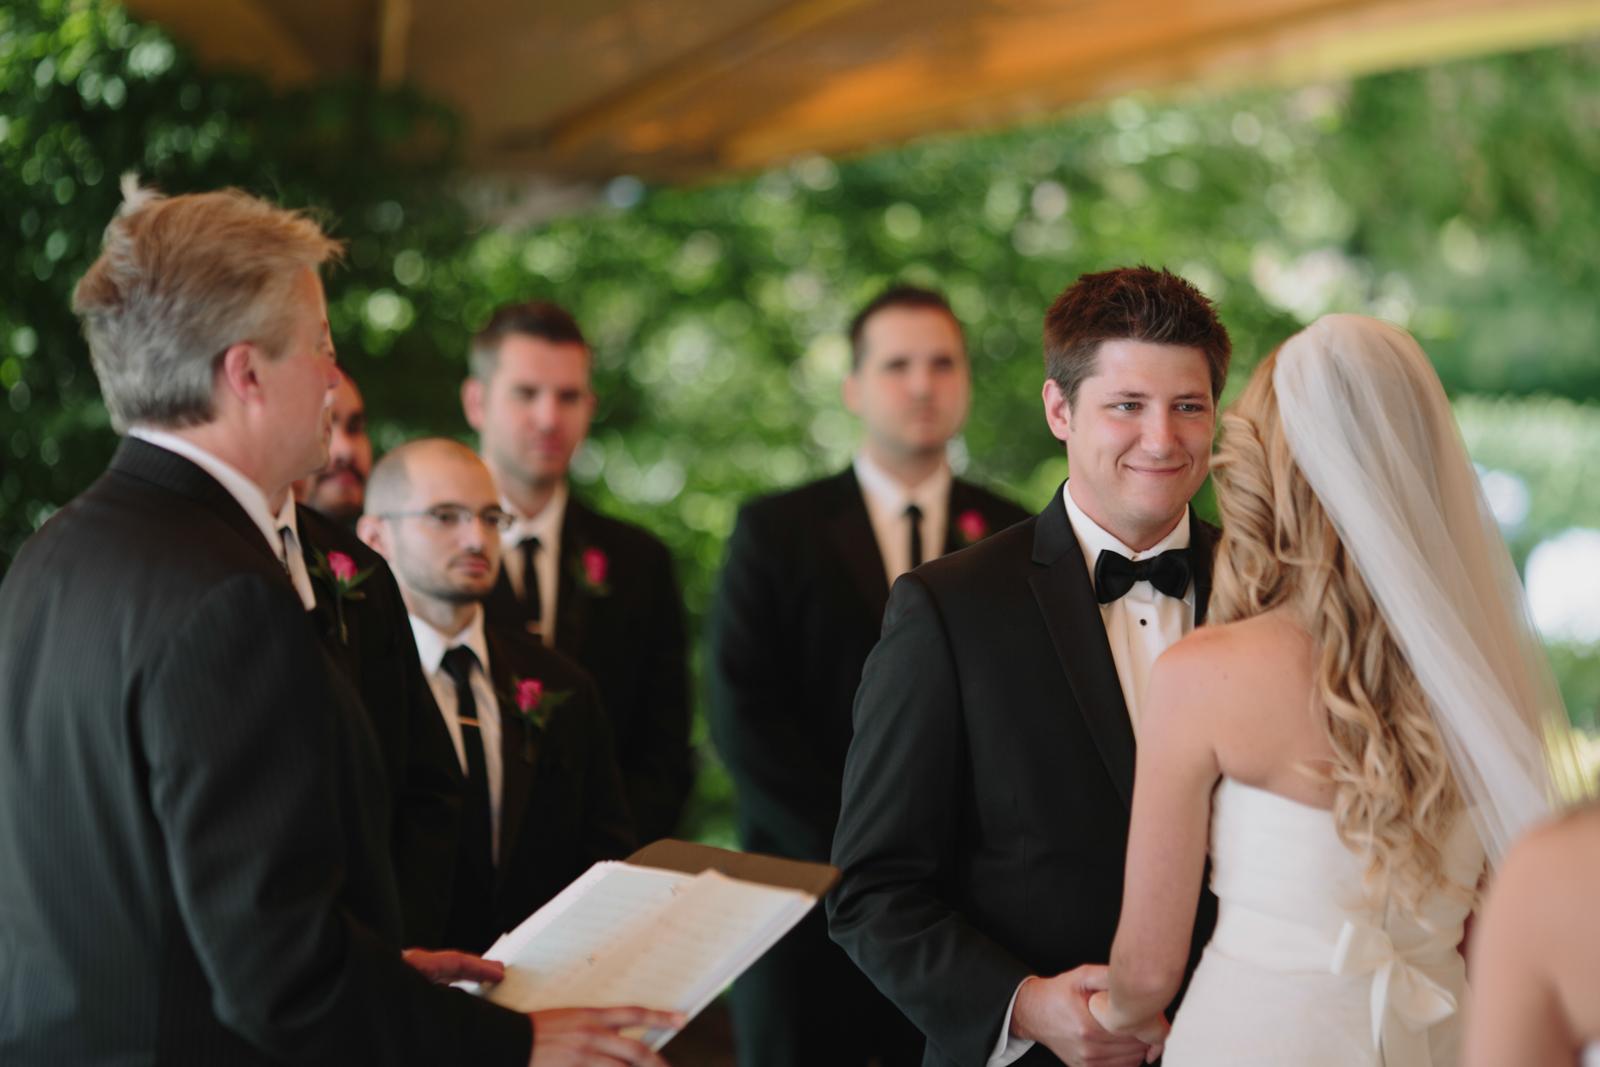 Northern Michigan Grand Traverse Resort Black Tie Wedding Photographer - Codee and Aaron-014.jpg